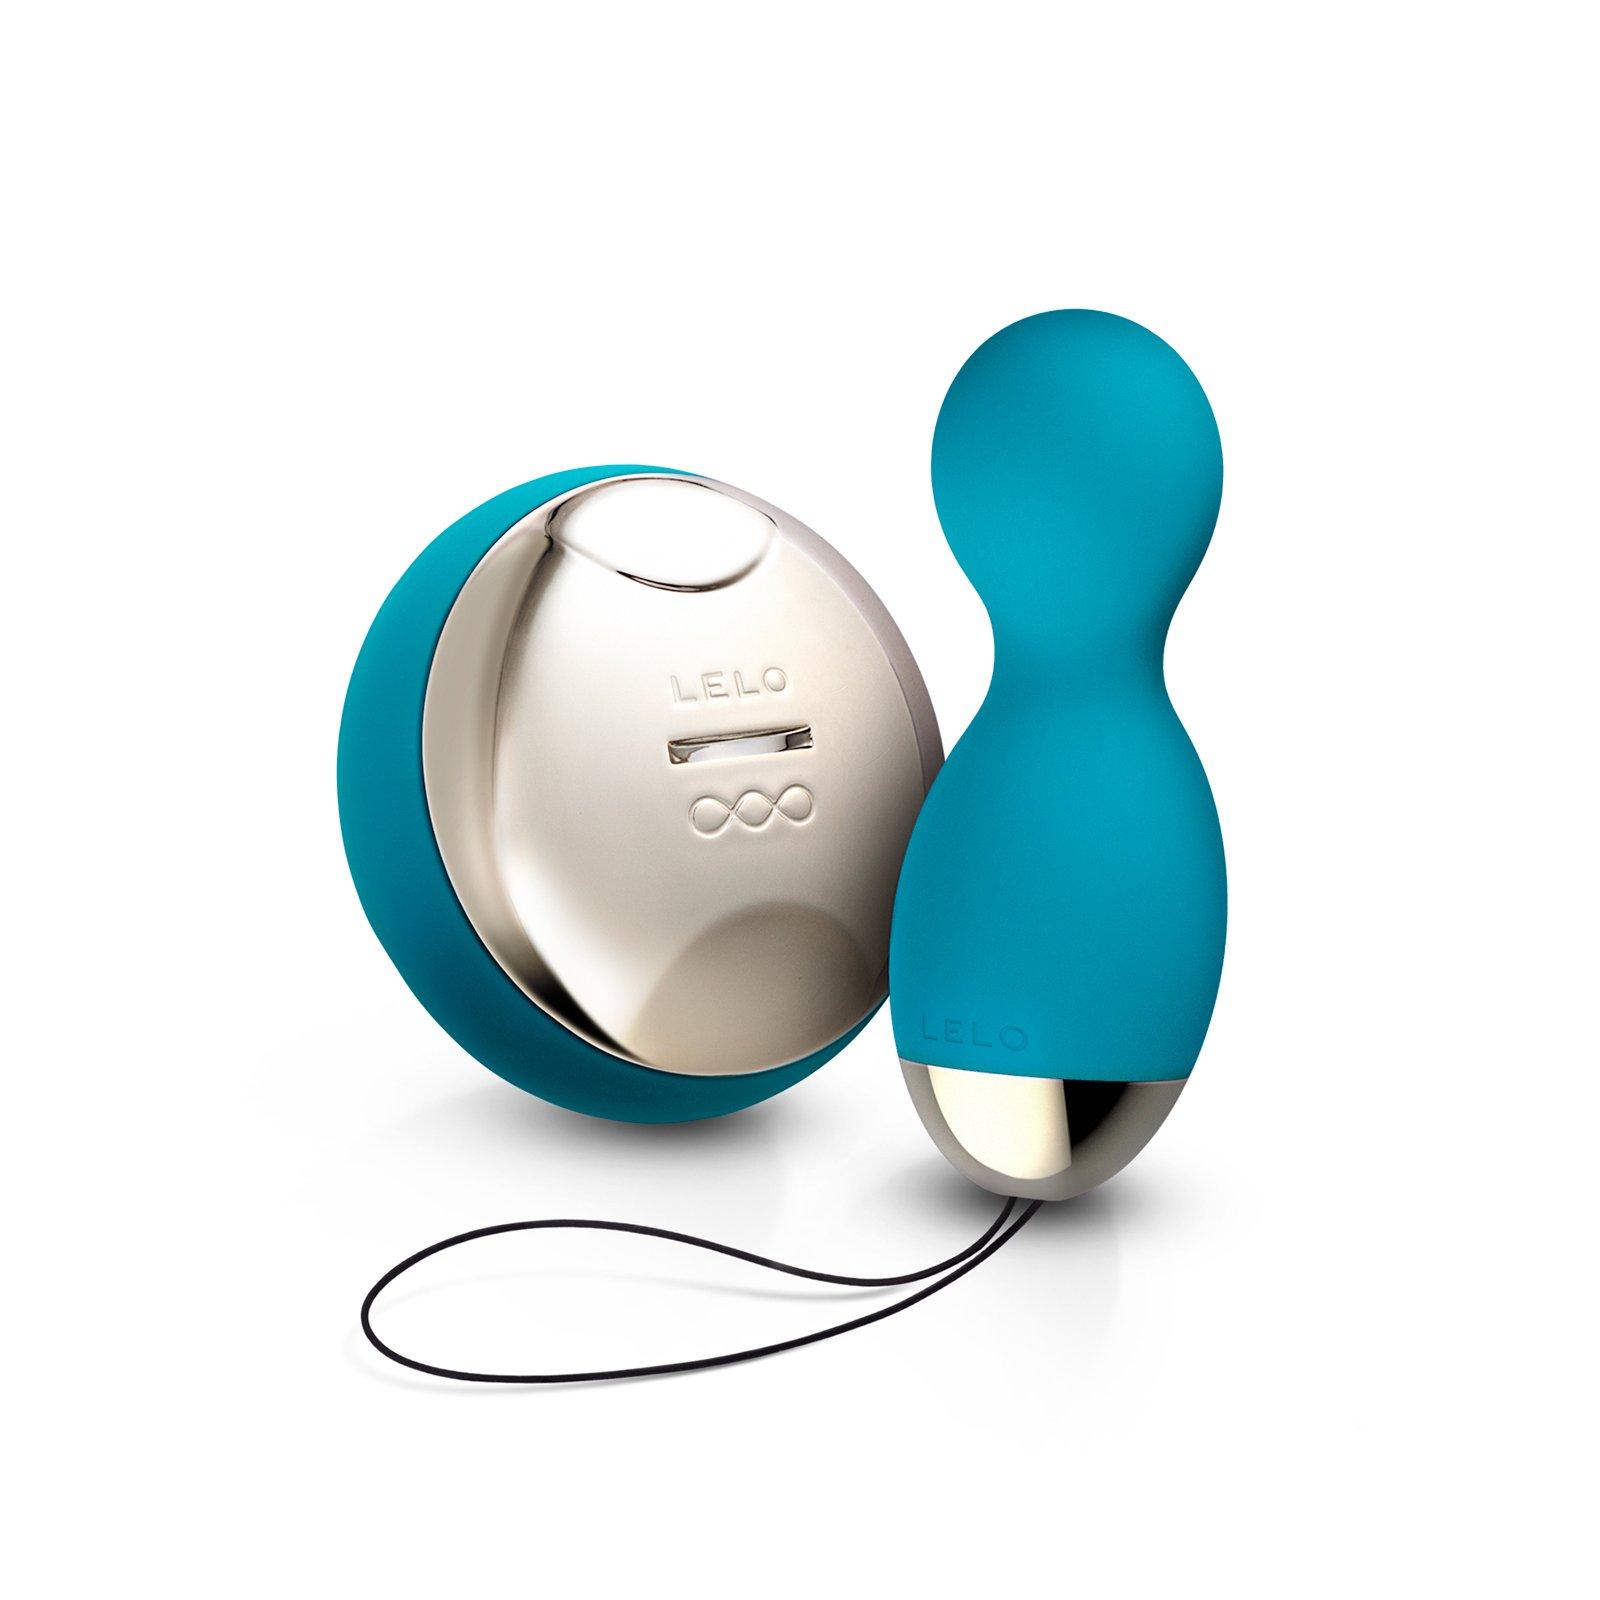 LELO Hula Beads Vibrating and Rotating Ben Wa Pleasure Balls, Waterproof, Ocean Blue by LELO